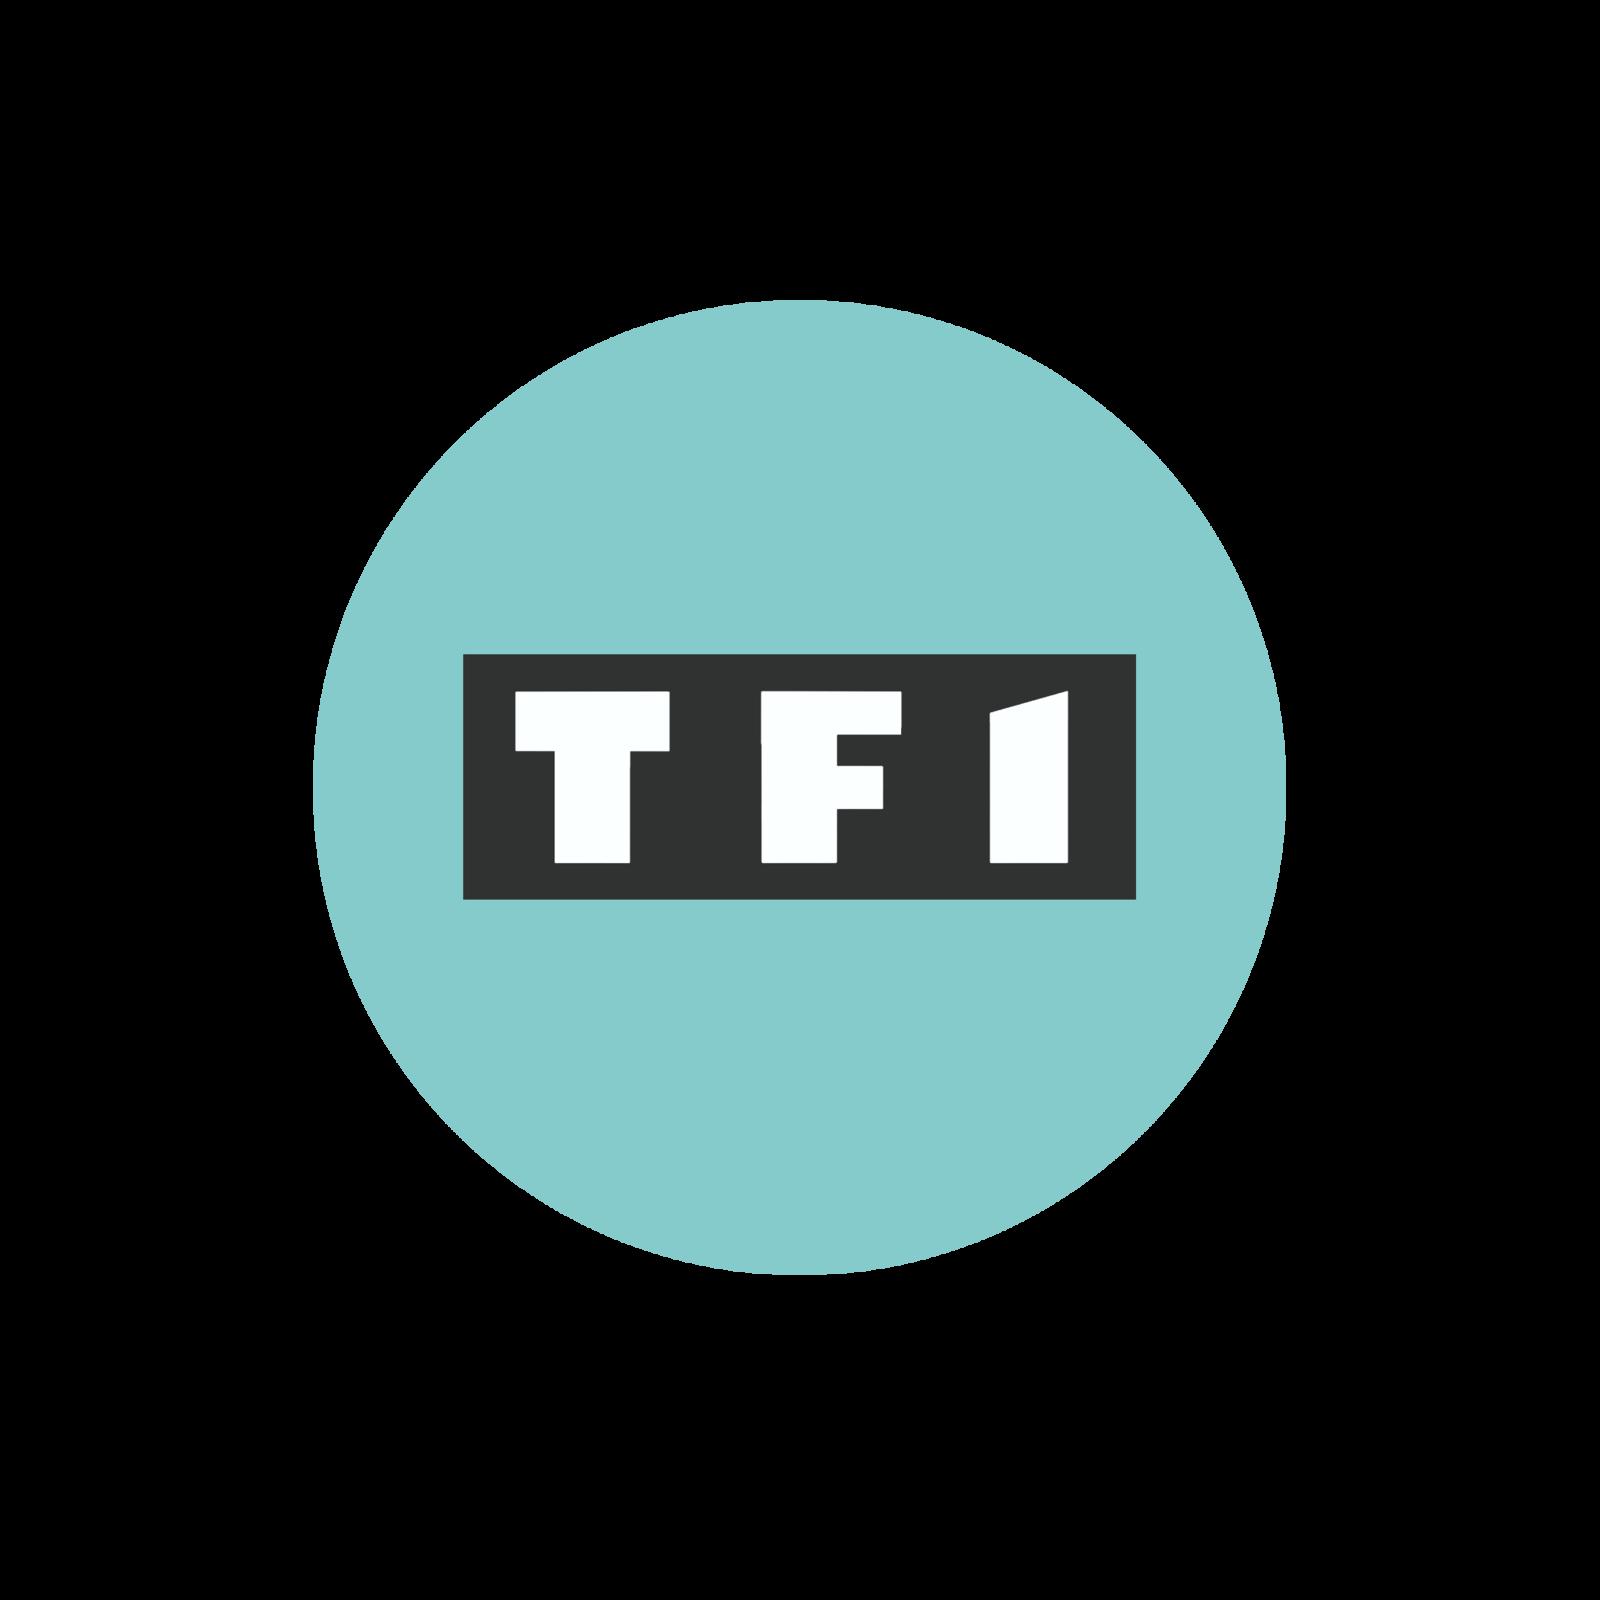 Les groupes TF1, ProSiebenSat. 1 et Mediaset créent European Broadcaster Exchange.